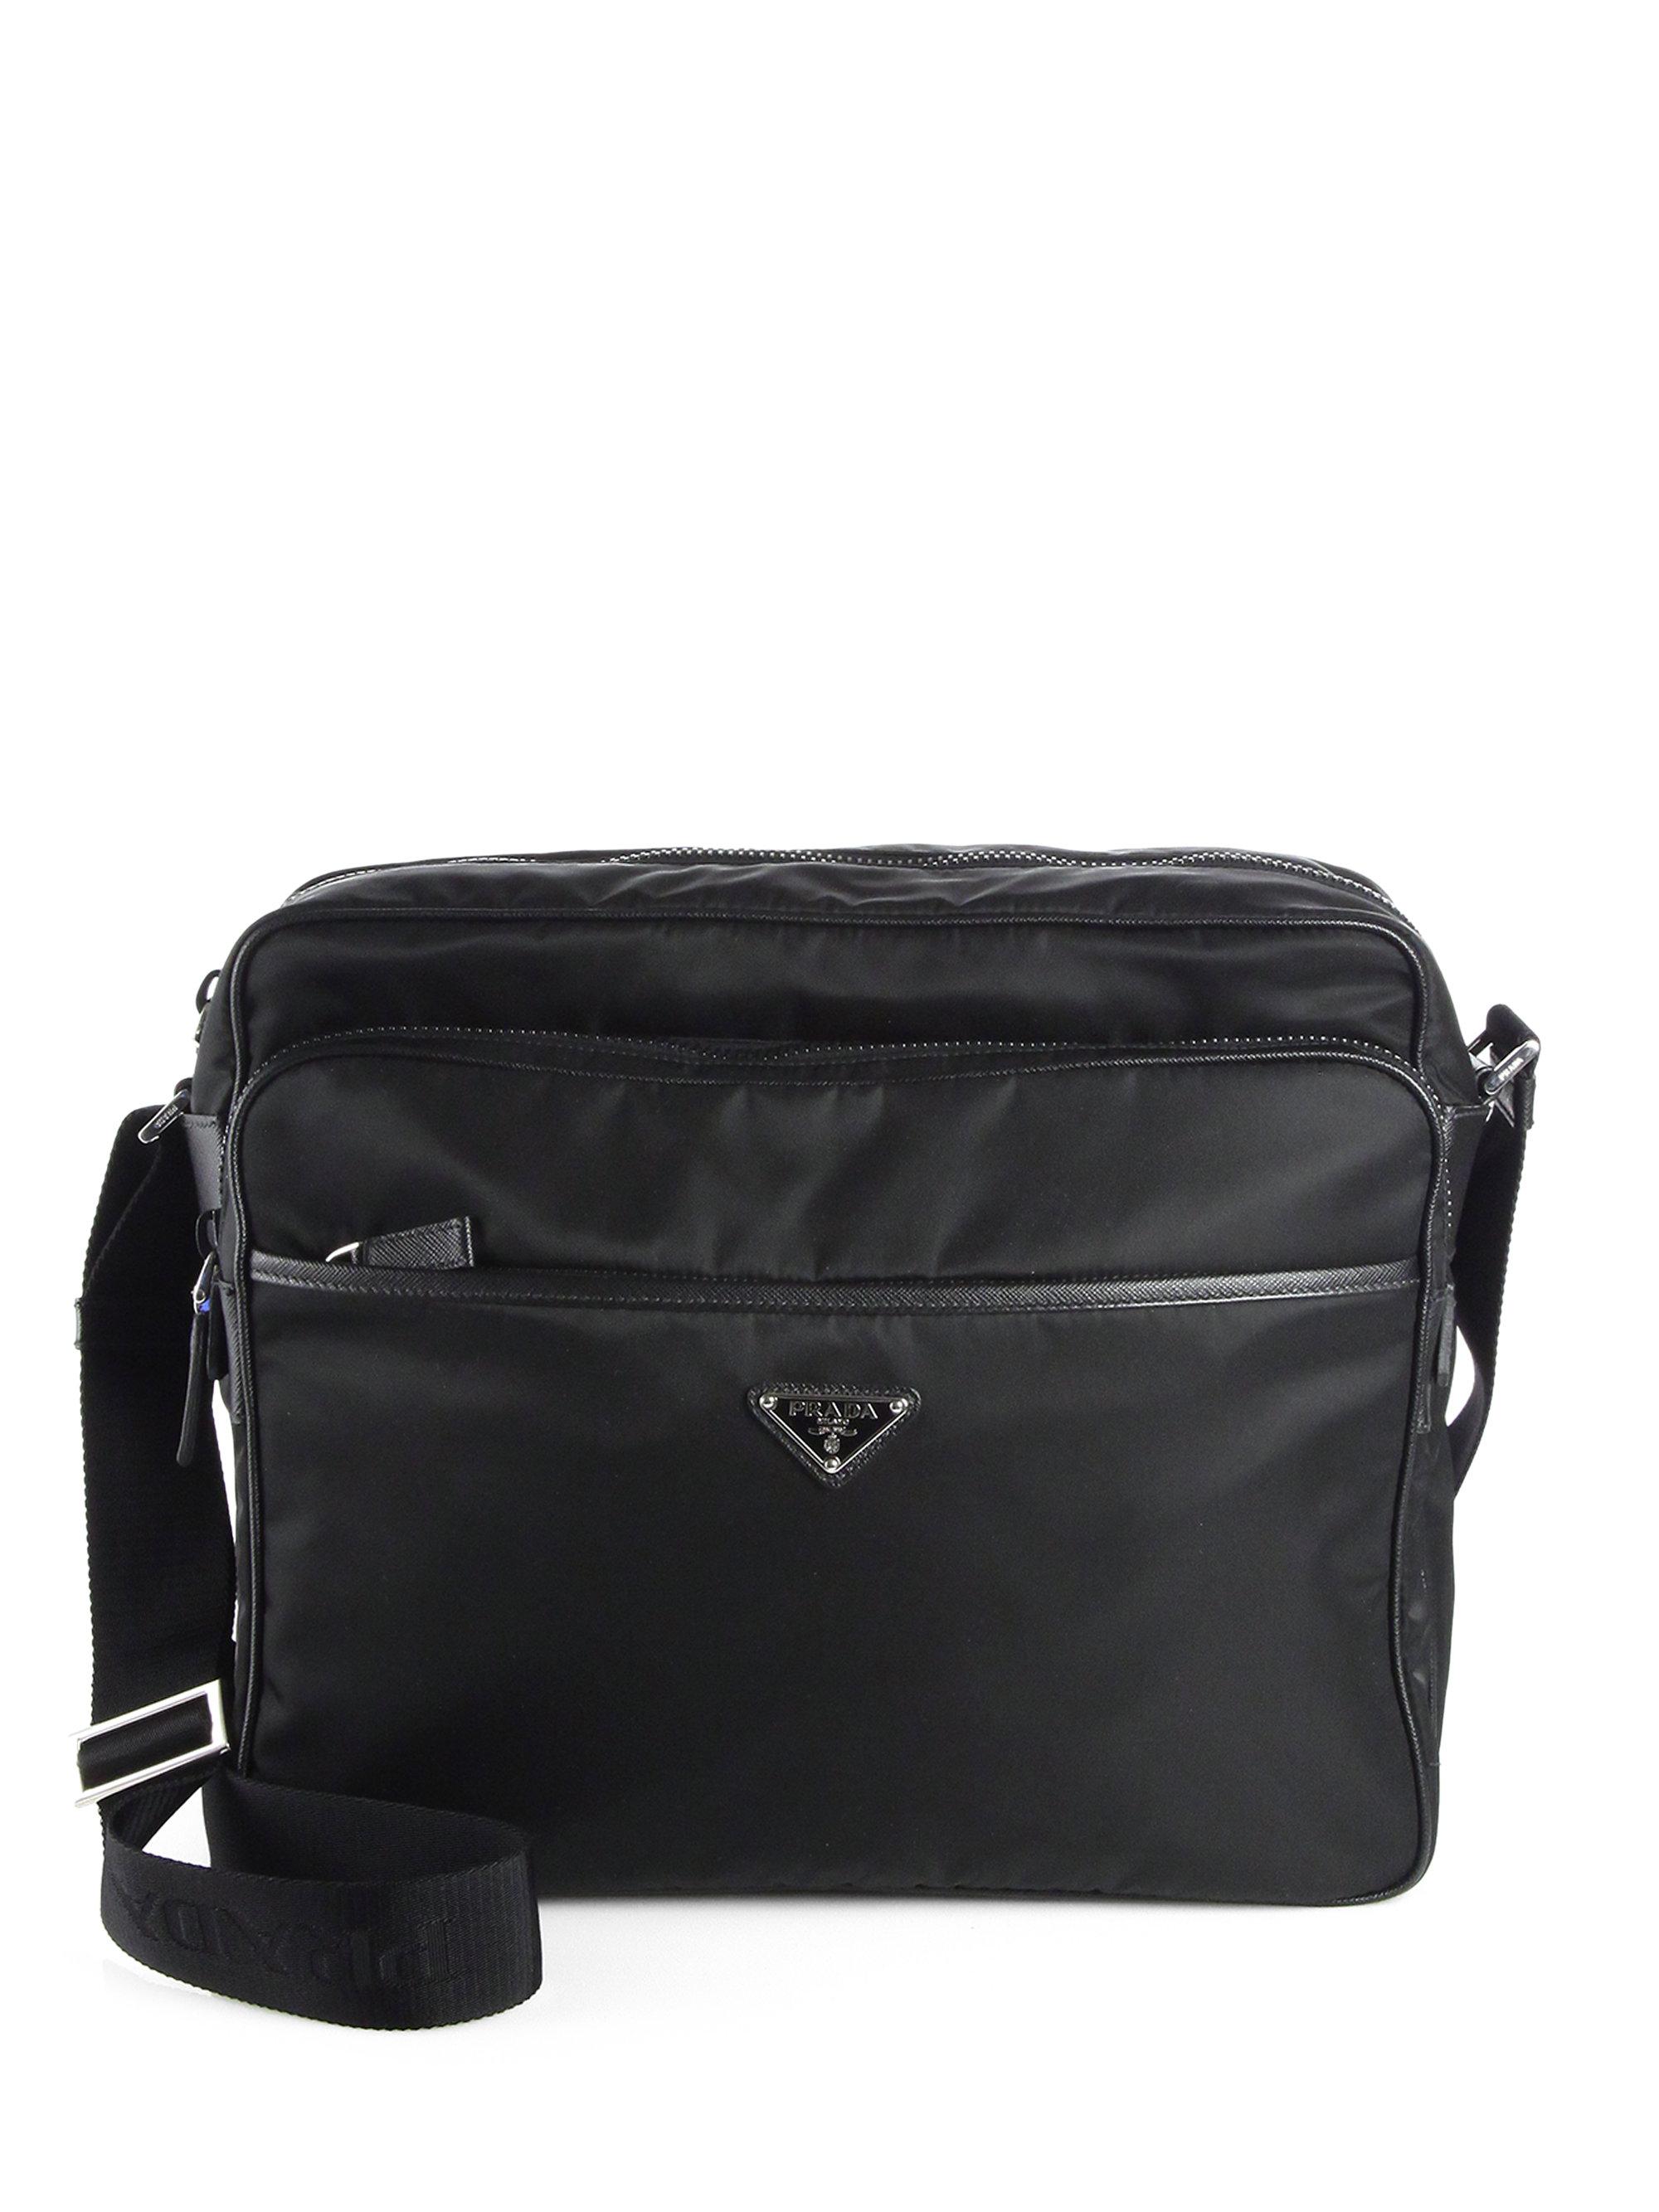 Prada Nylon Crossbody Bag In Black For Men Lyst